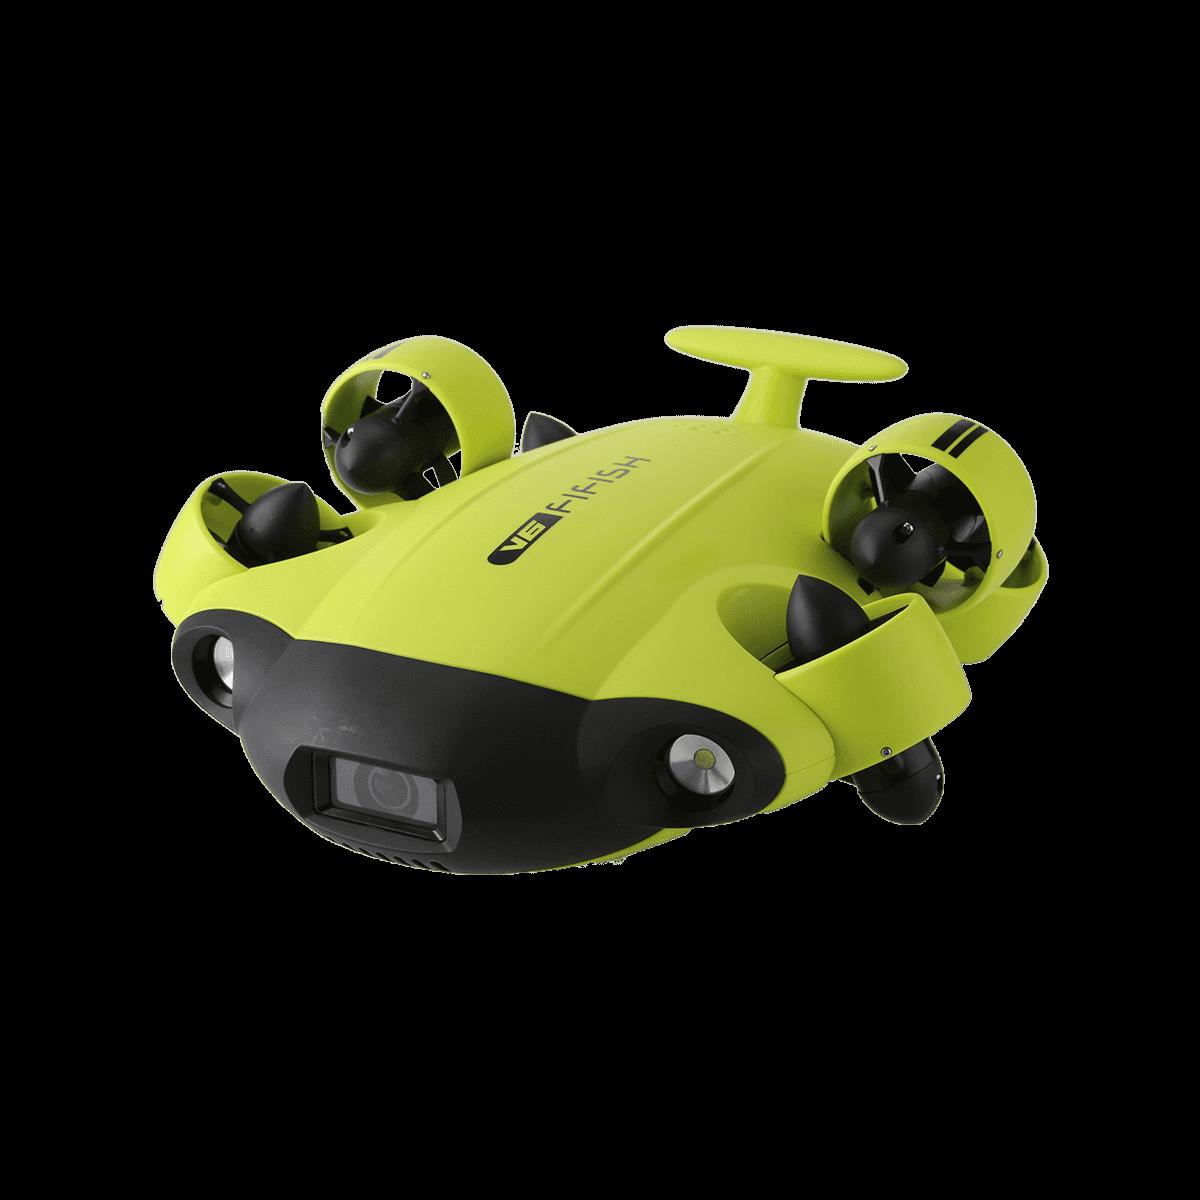 FIFISH V6 (ファイフィッシュ V6) 水中ドローン